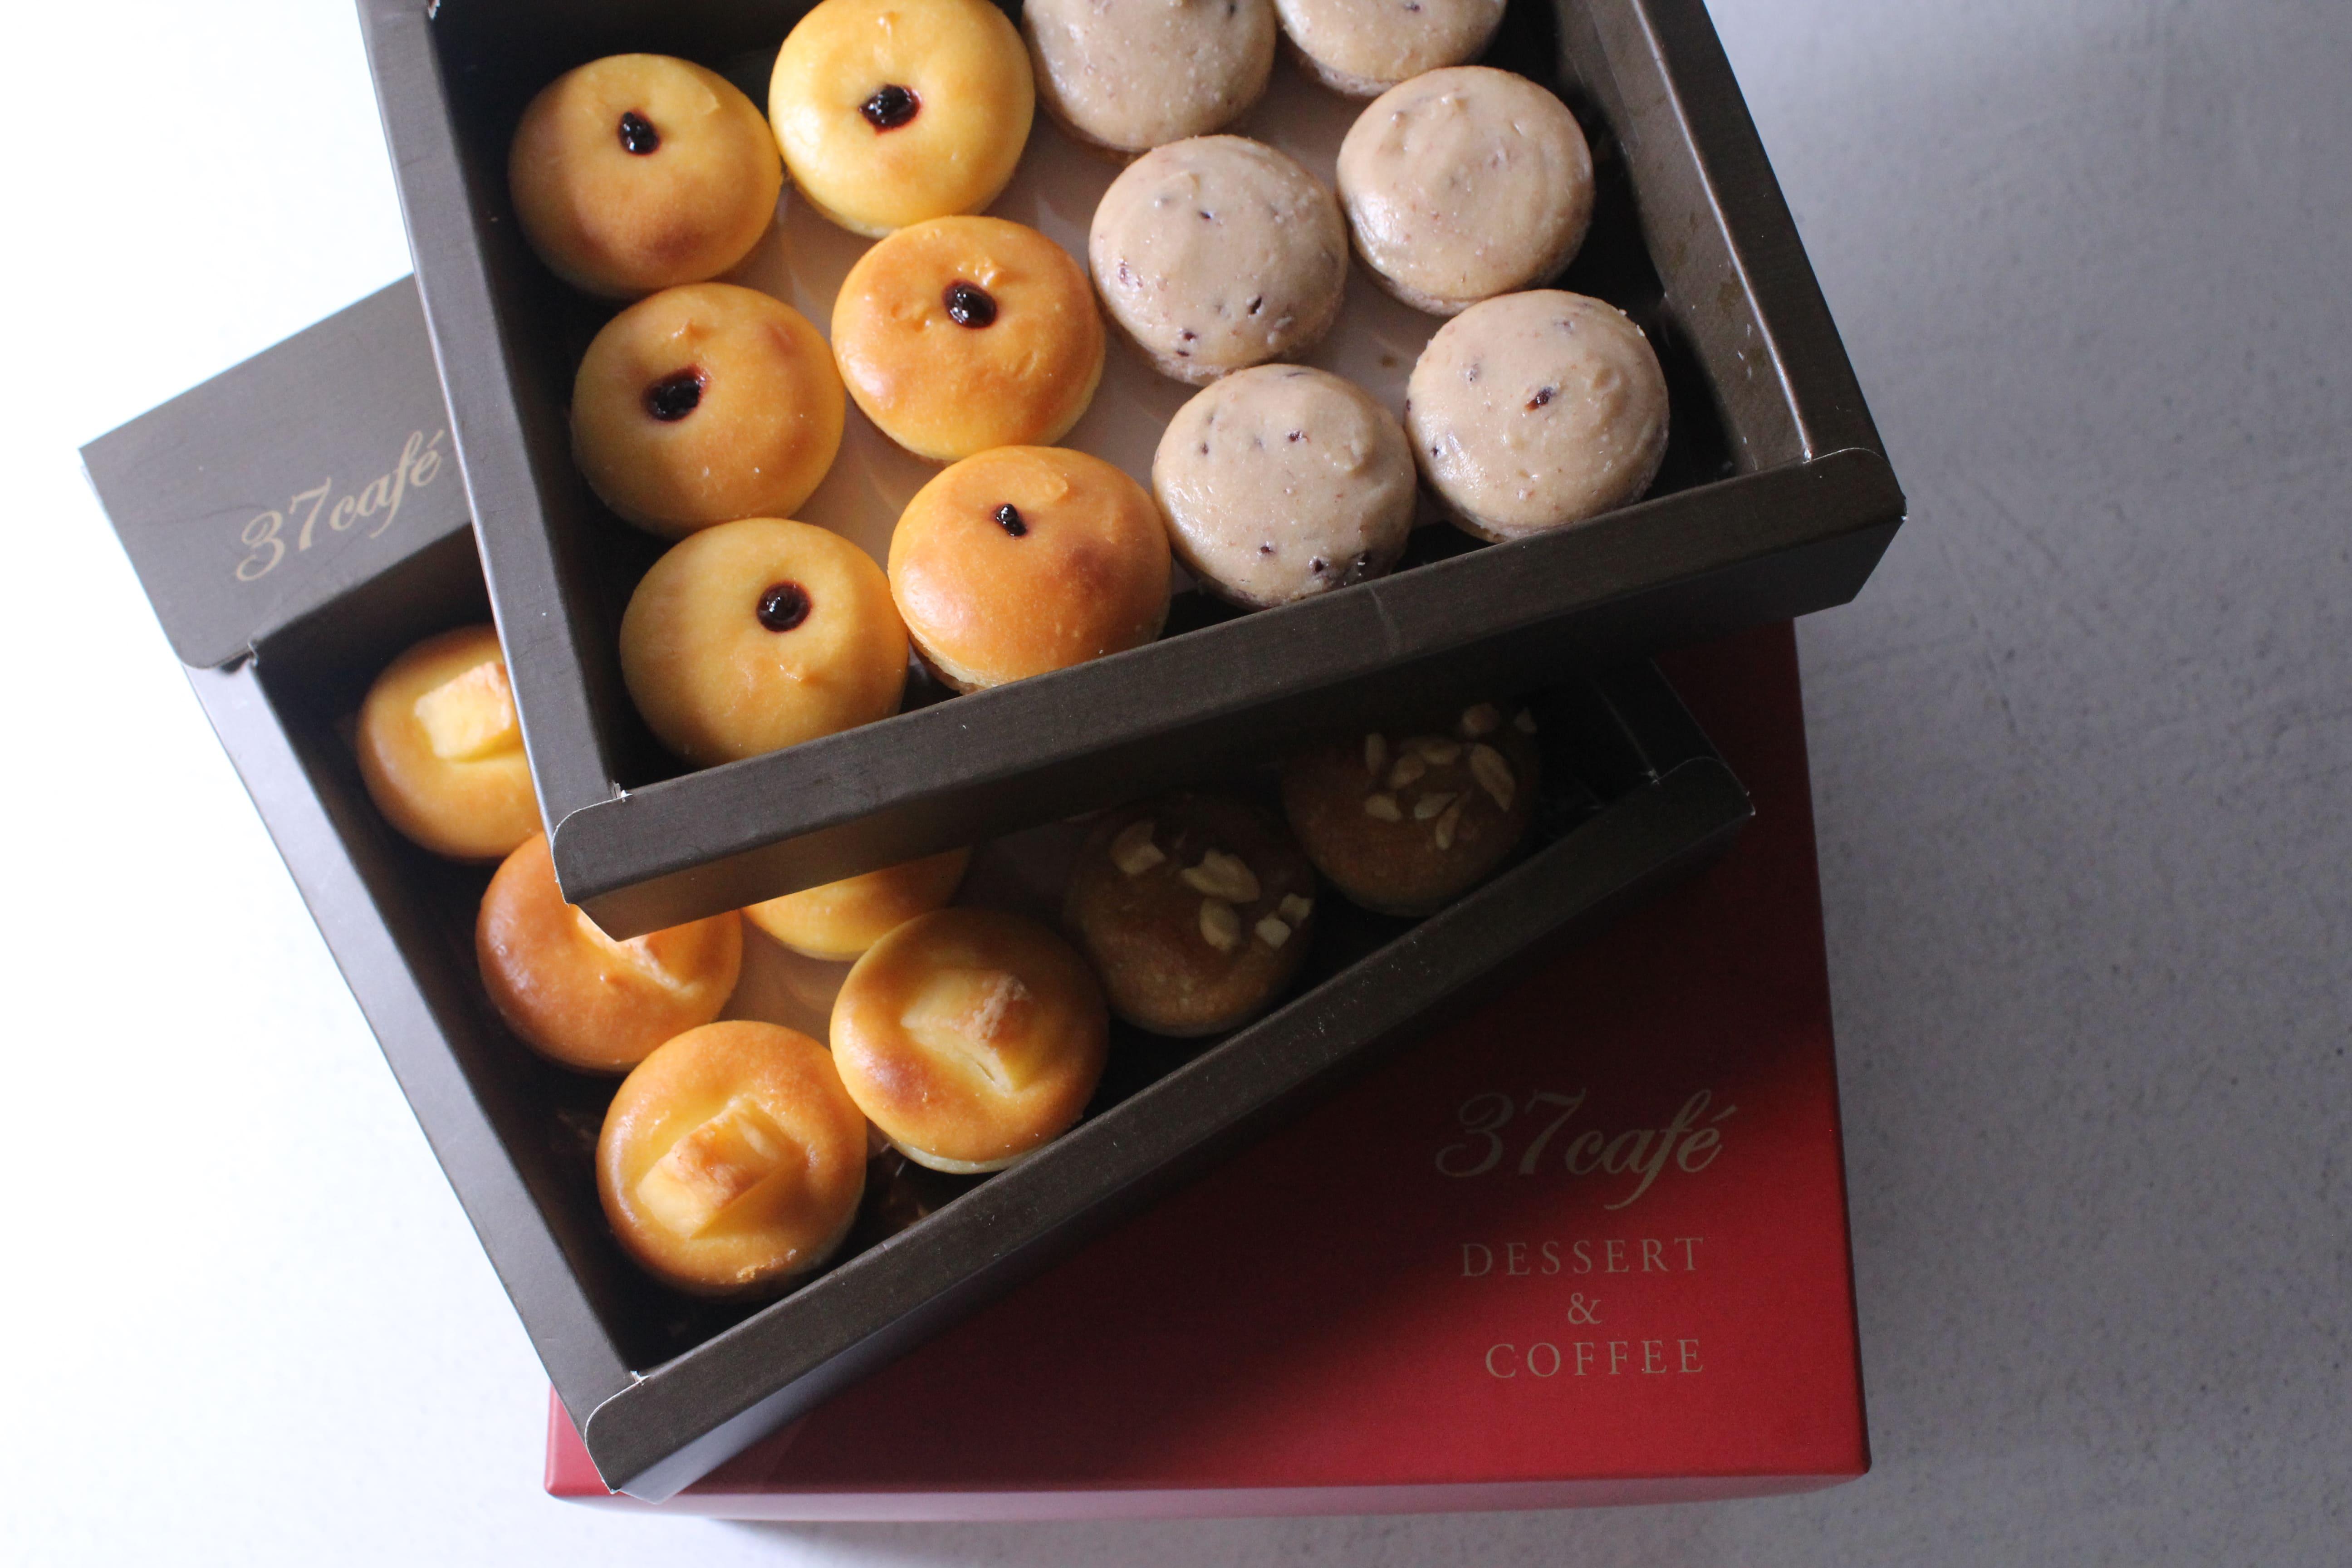 【37cafe手工甜點】團購下午茶美食-綜合乳酪球 (24入)